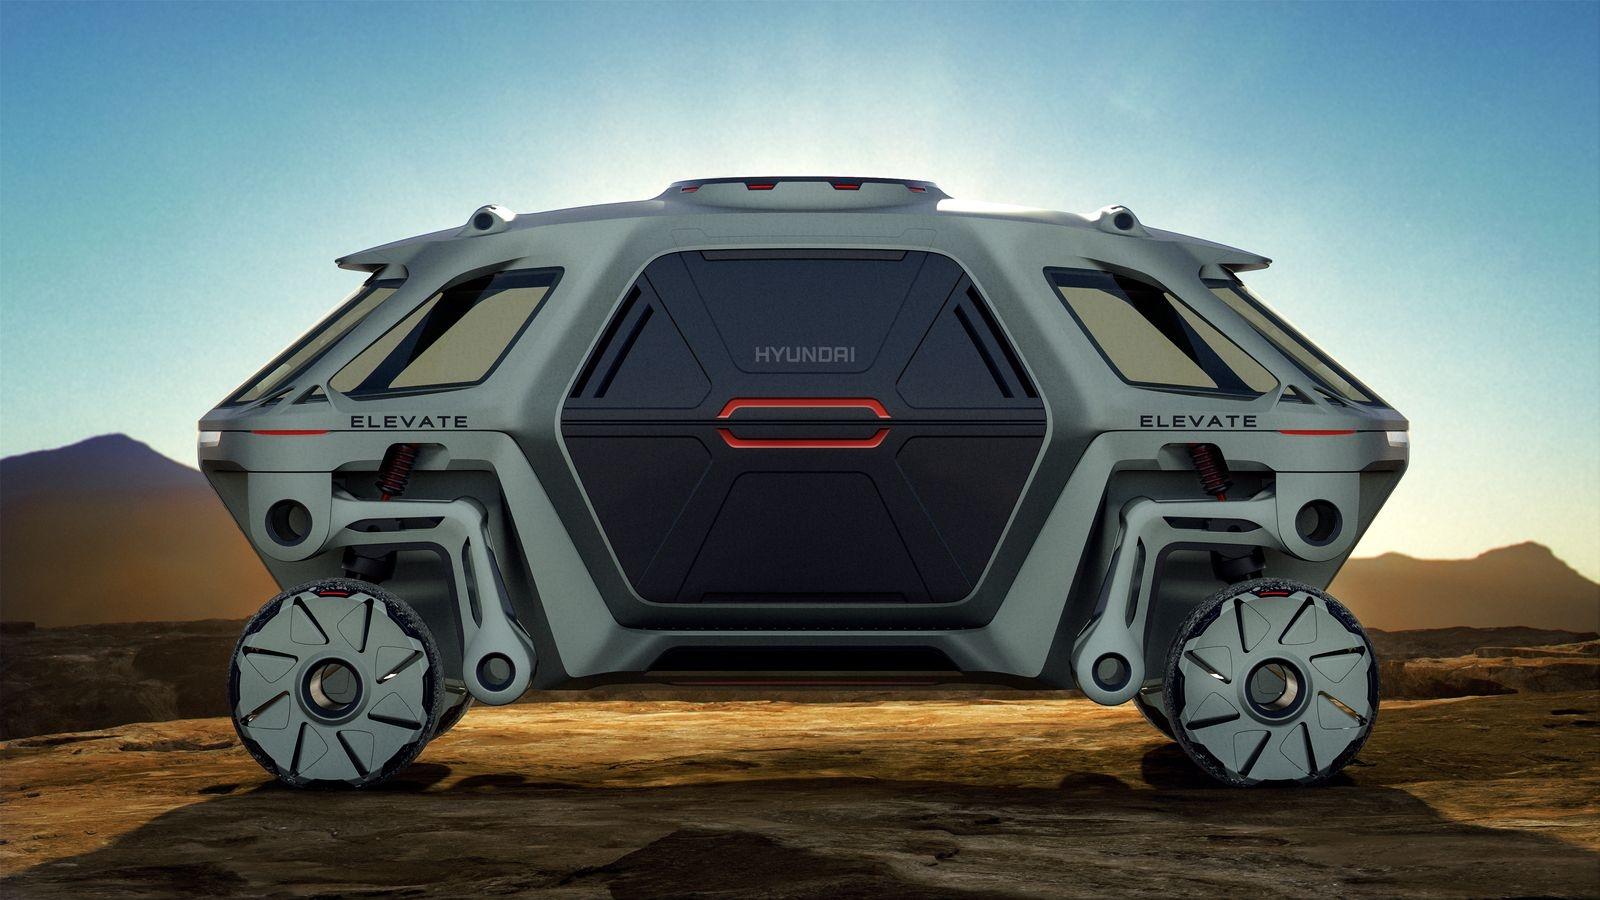 HyundaiElevate_AutoRok_2019_06